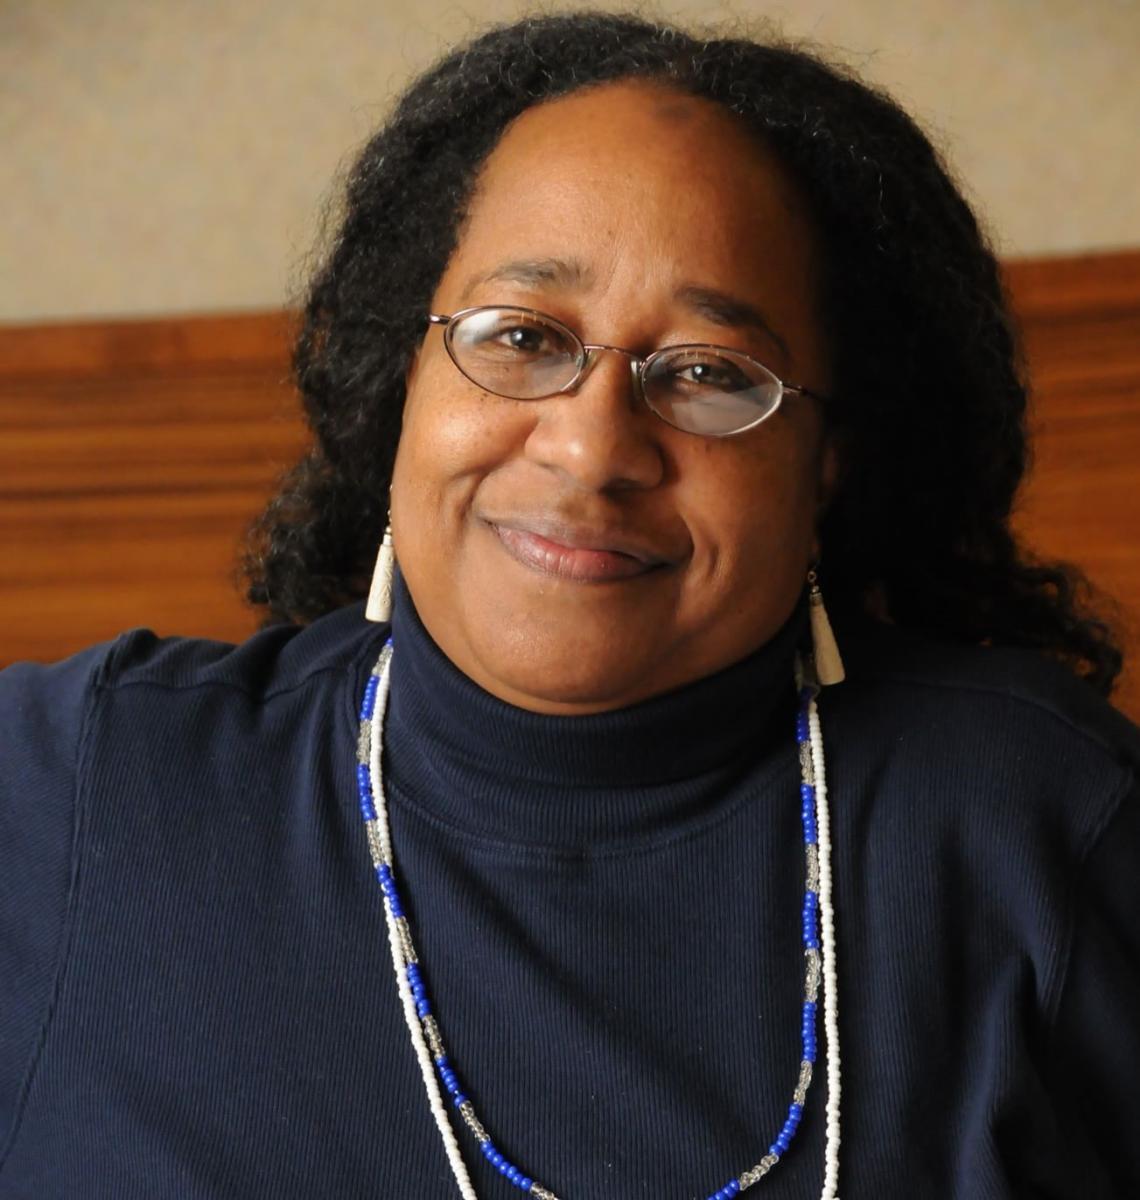 Headshot of EPN Oct 12 speaker Omope Carter Daboiku in a black blouse